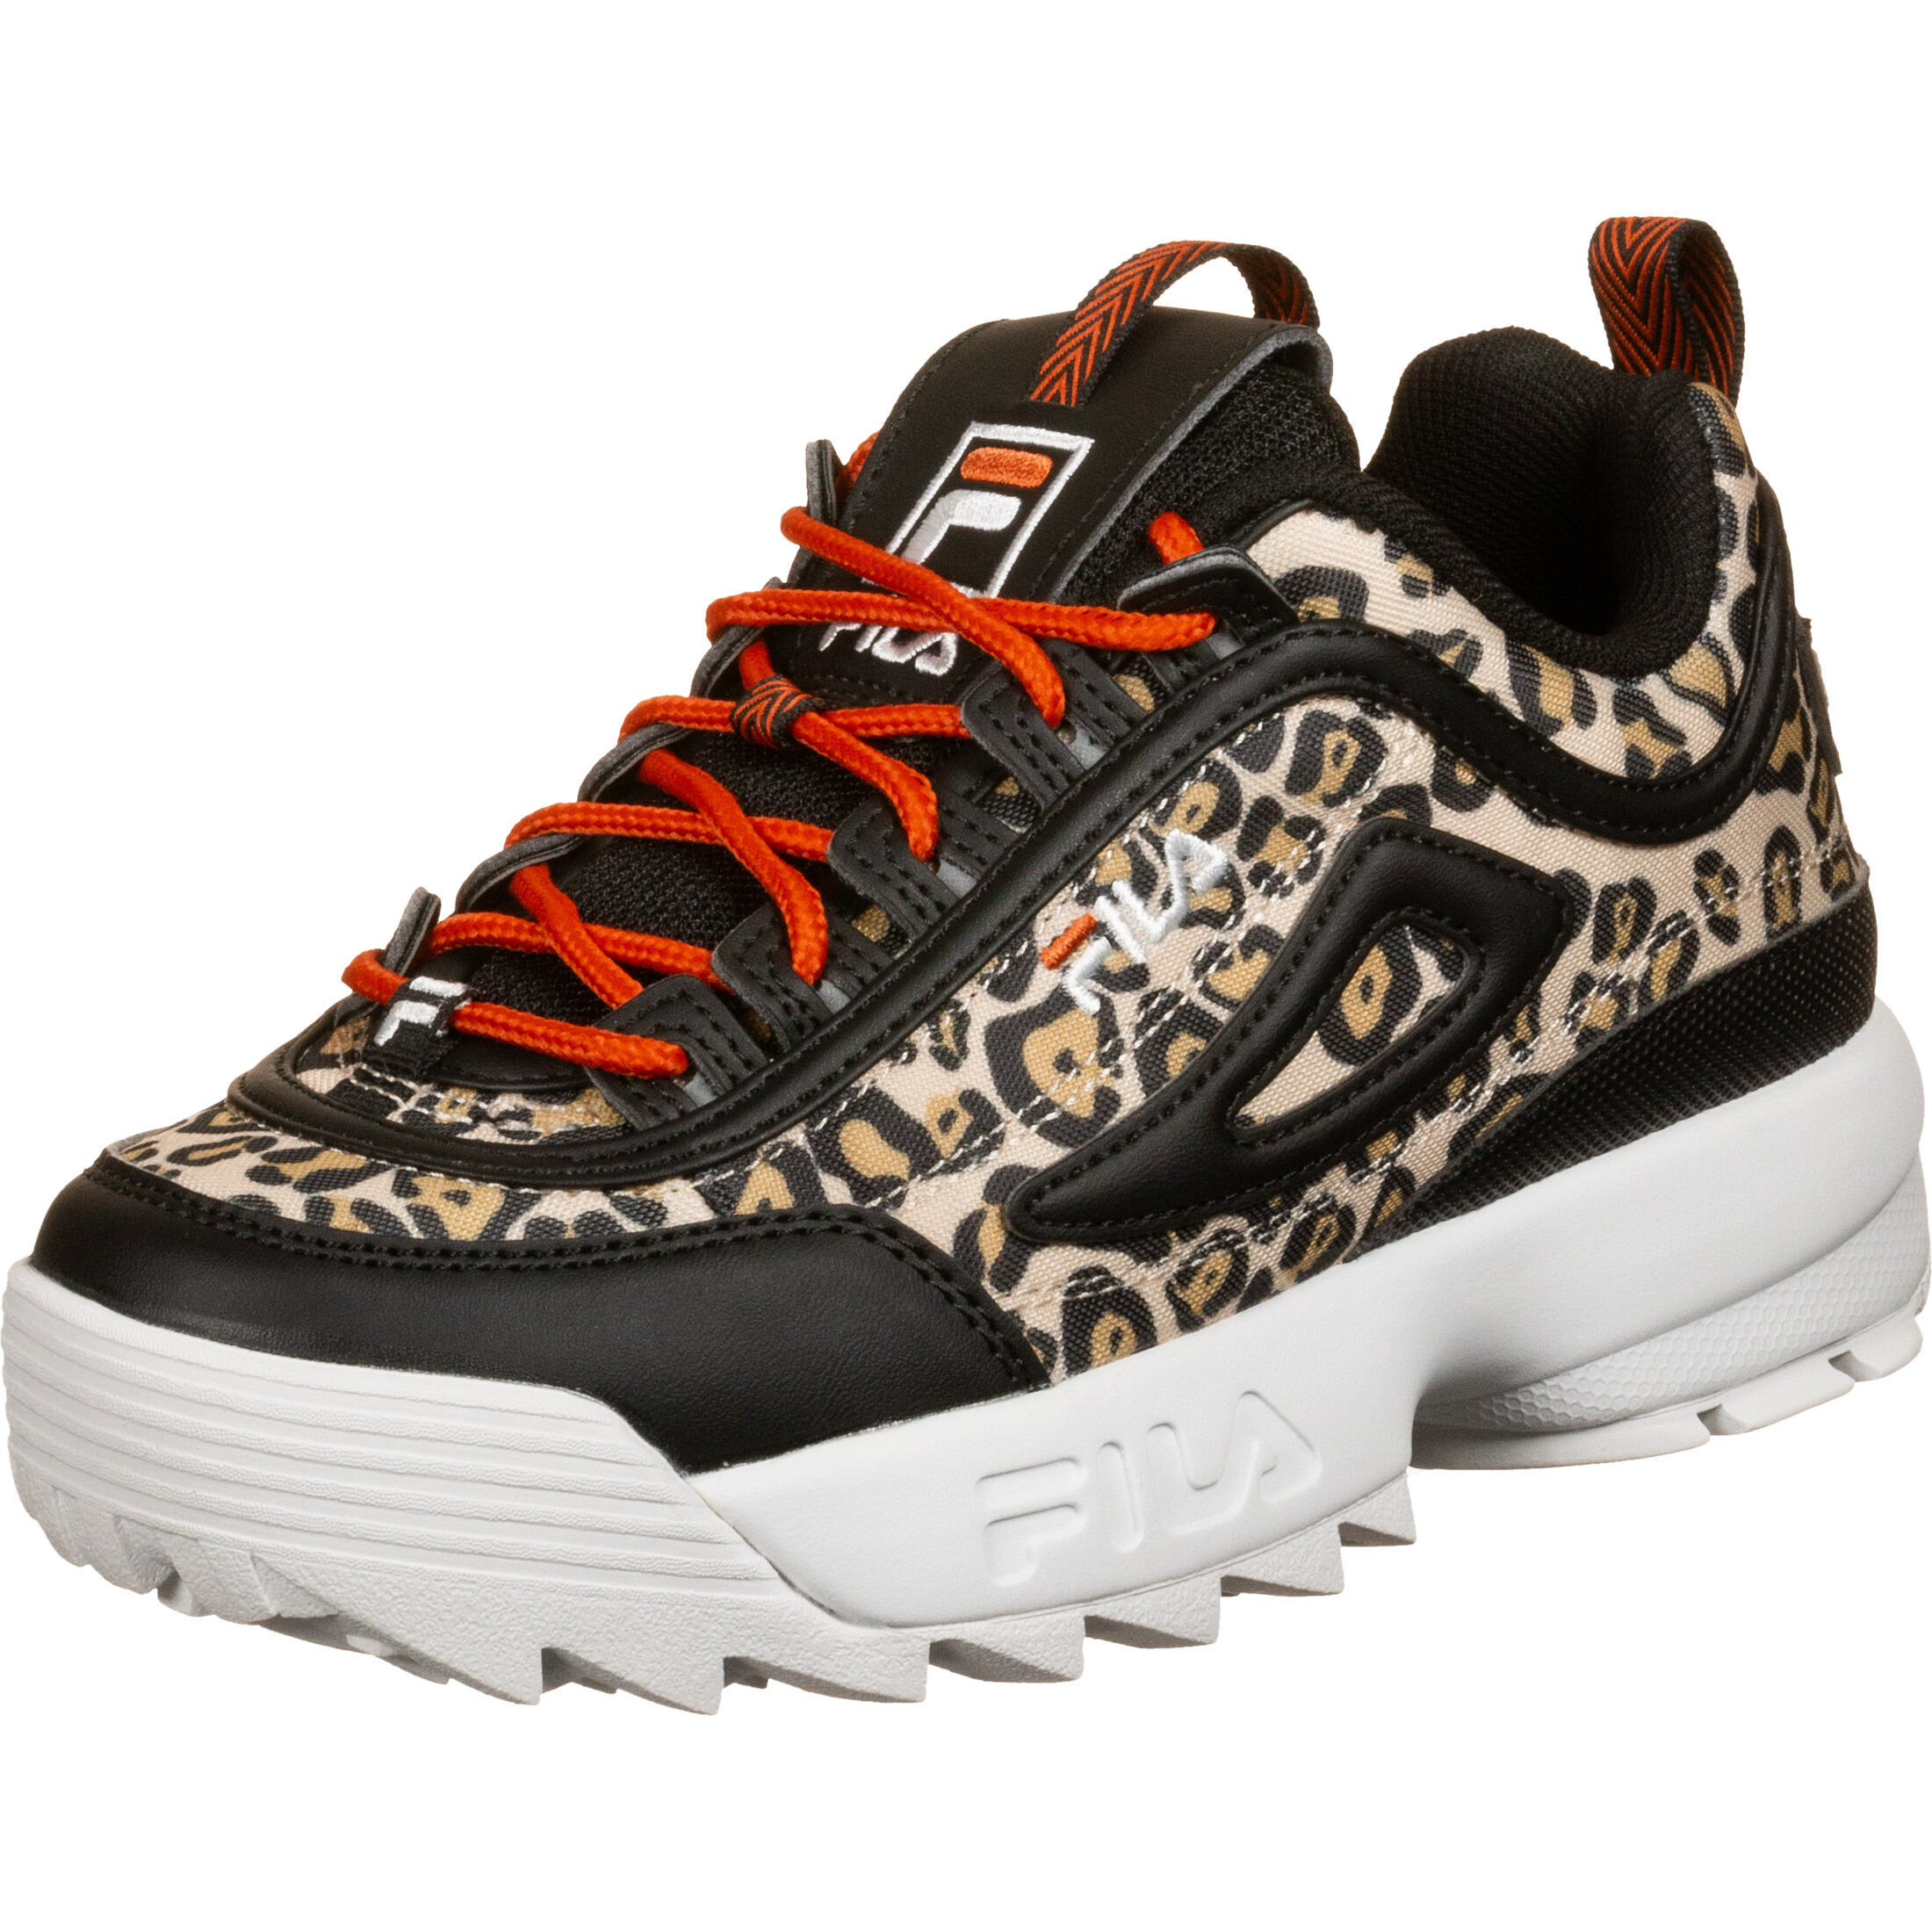 fila leopard shoes